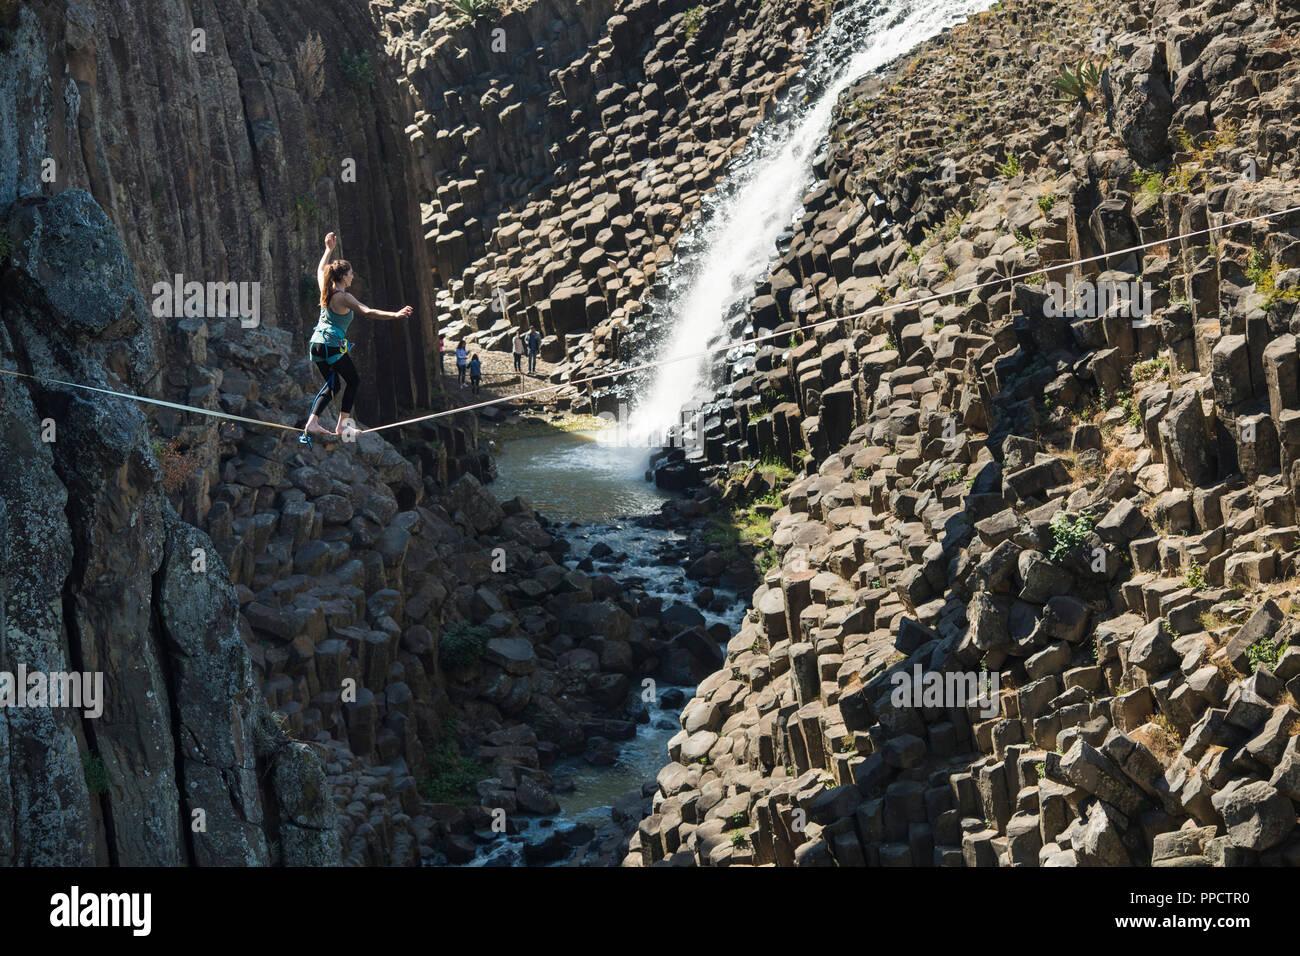 Young woman balancing on tightrope across Basaltic Prisms of Santa Maria Regla, Huasca de Ocampo, Hidalgo, Mexico - Stock Image